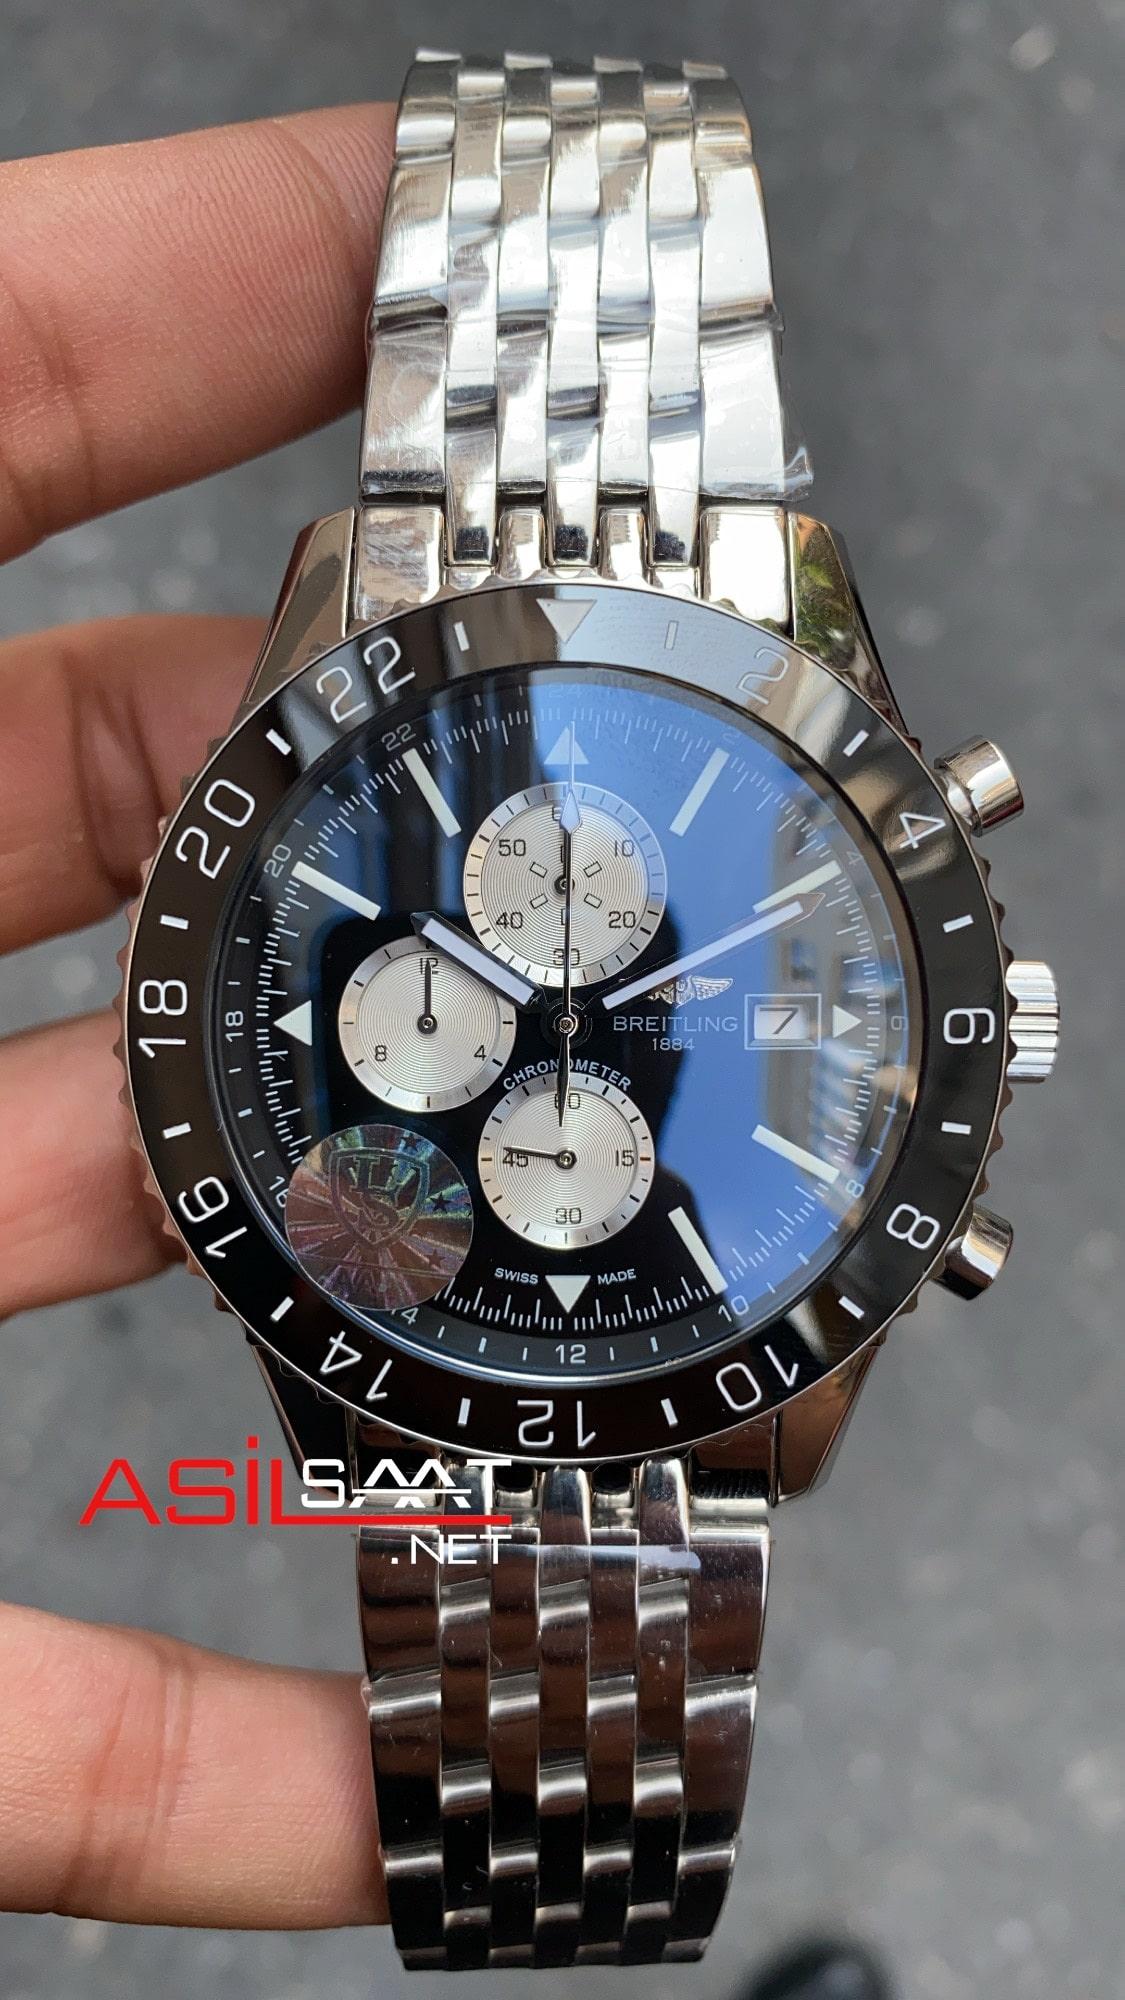 Breitling Manufacture En Suisse BME001